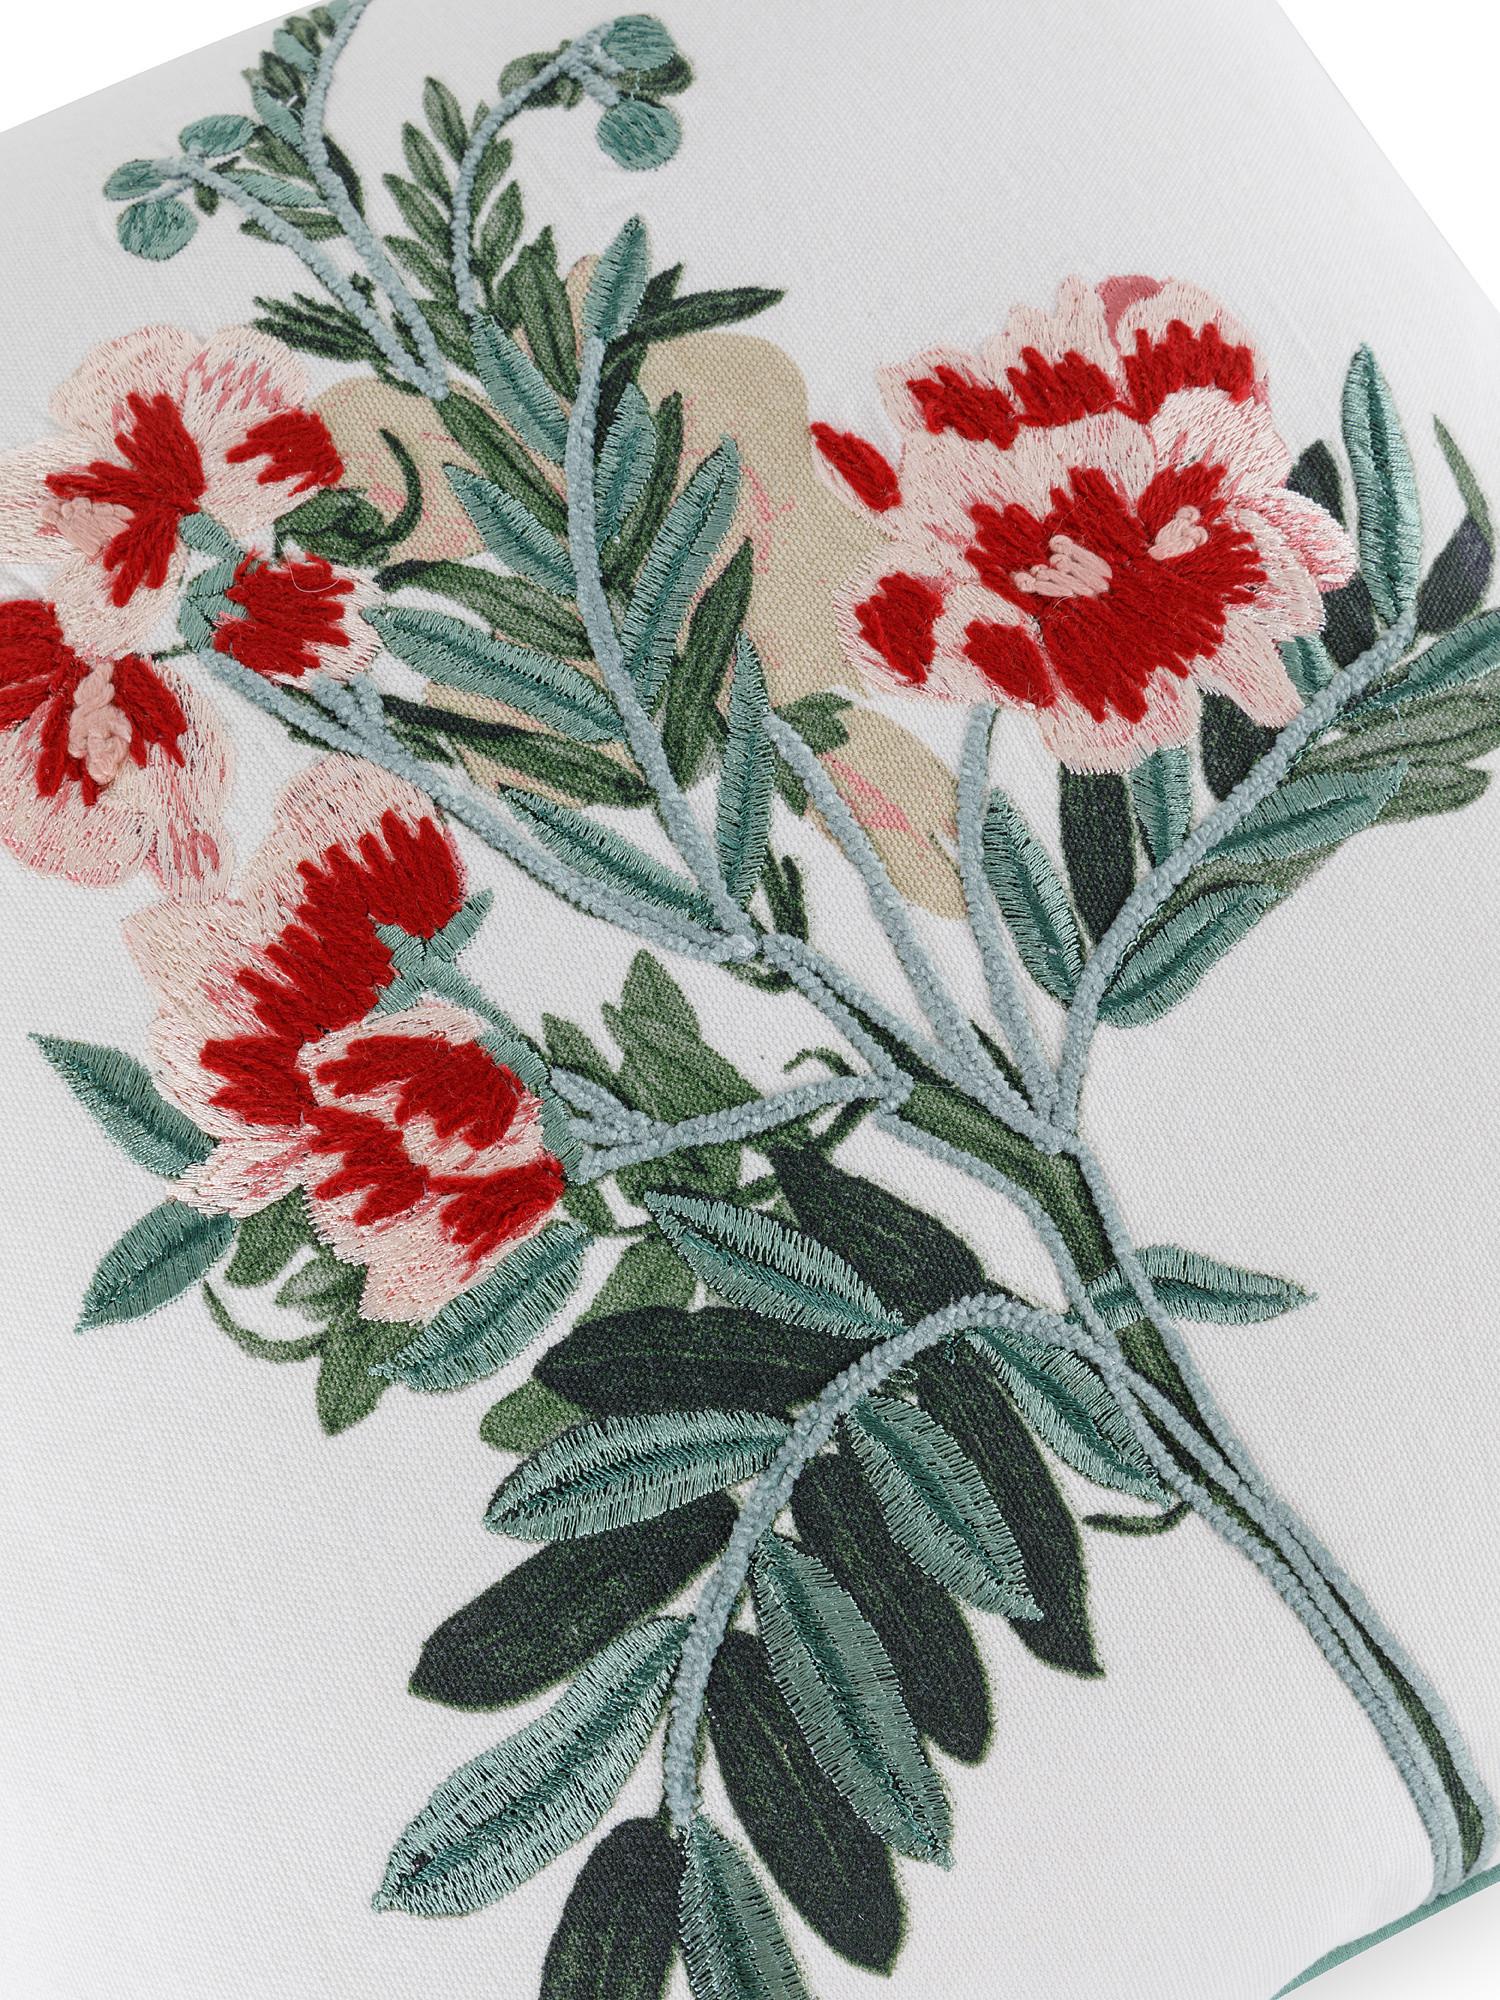 Cuscino cotone ricamo floreale 45x45cm, Multicolor, large image number 2